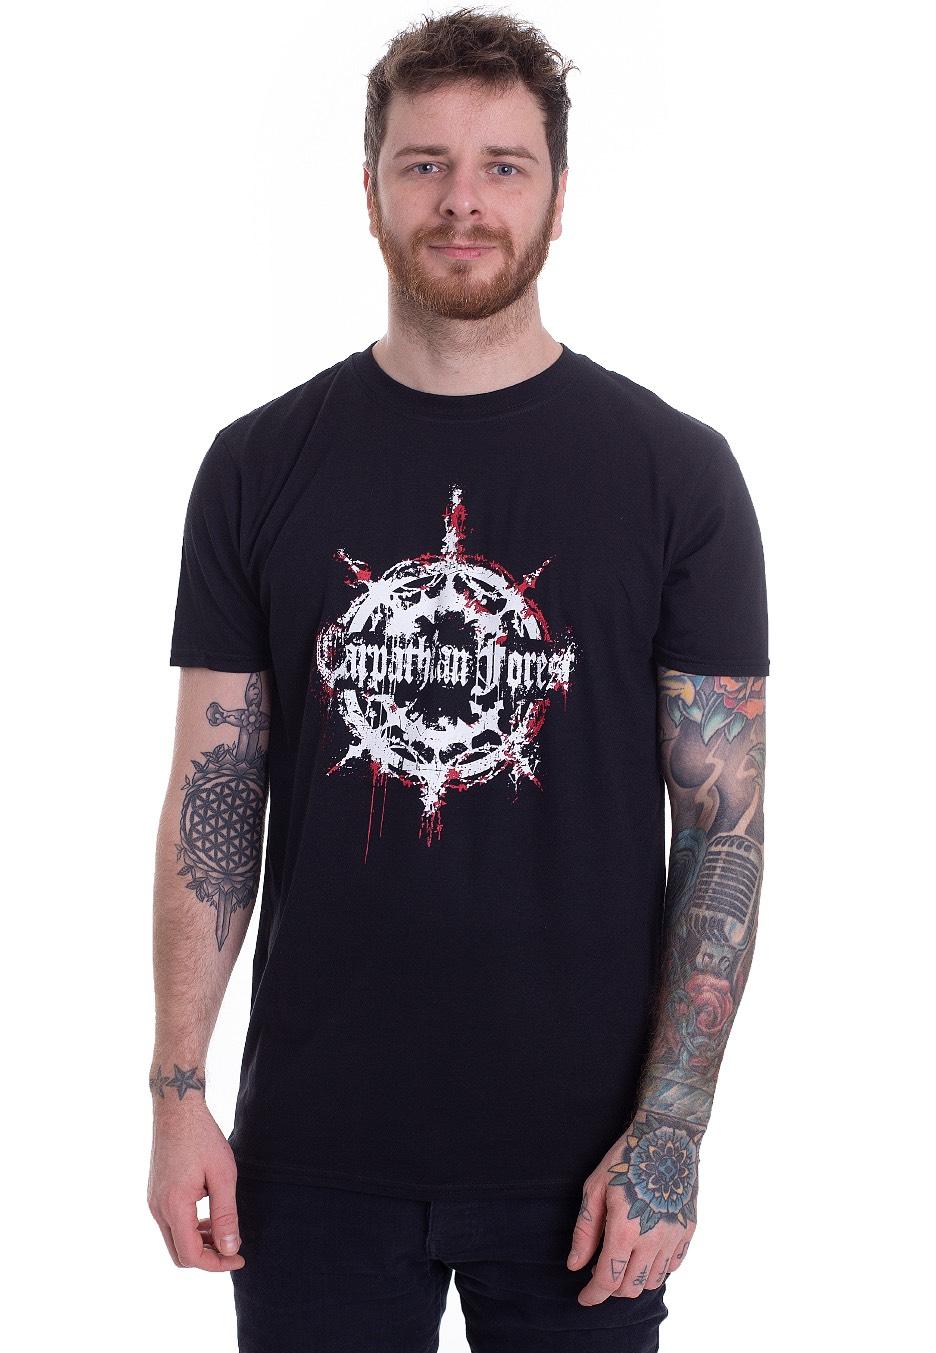 T-Shirt CARPATHIAN FOREST Likeim